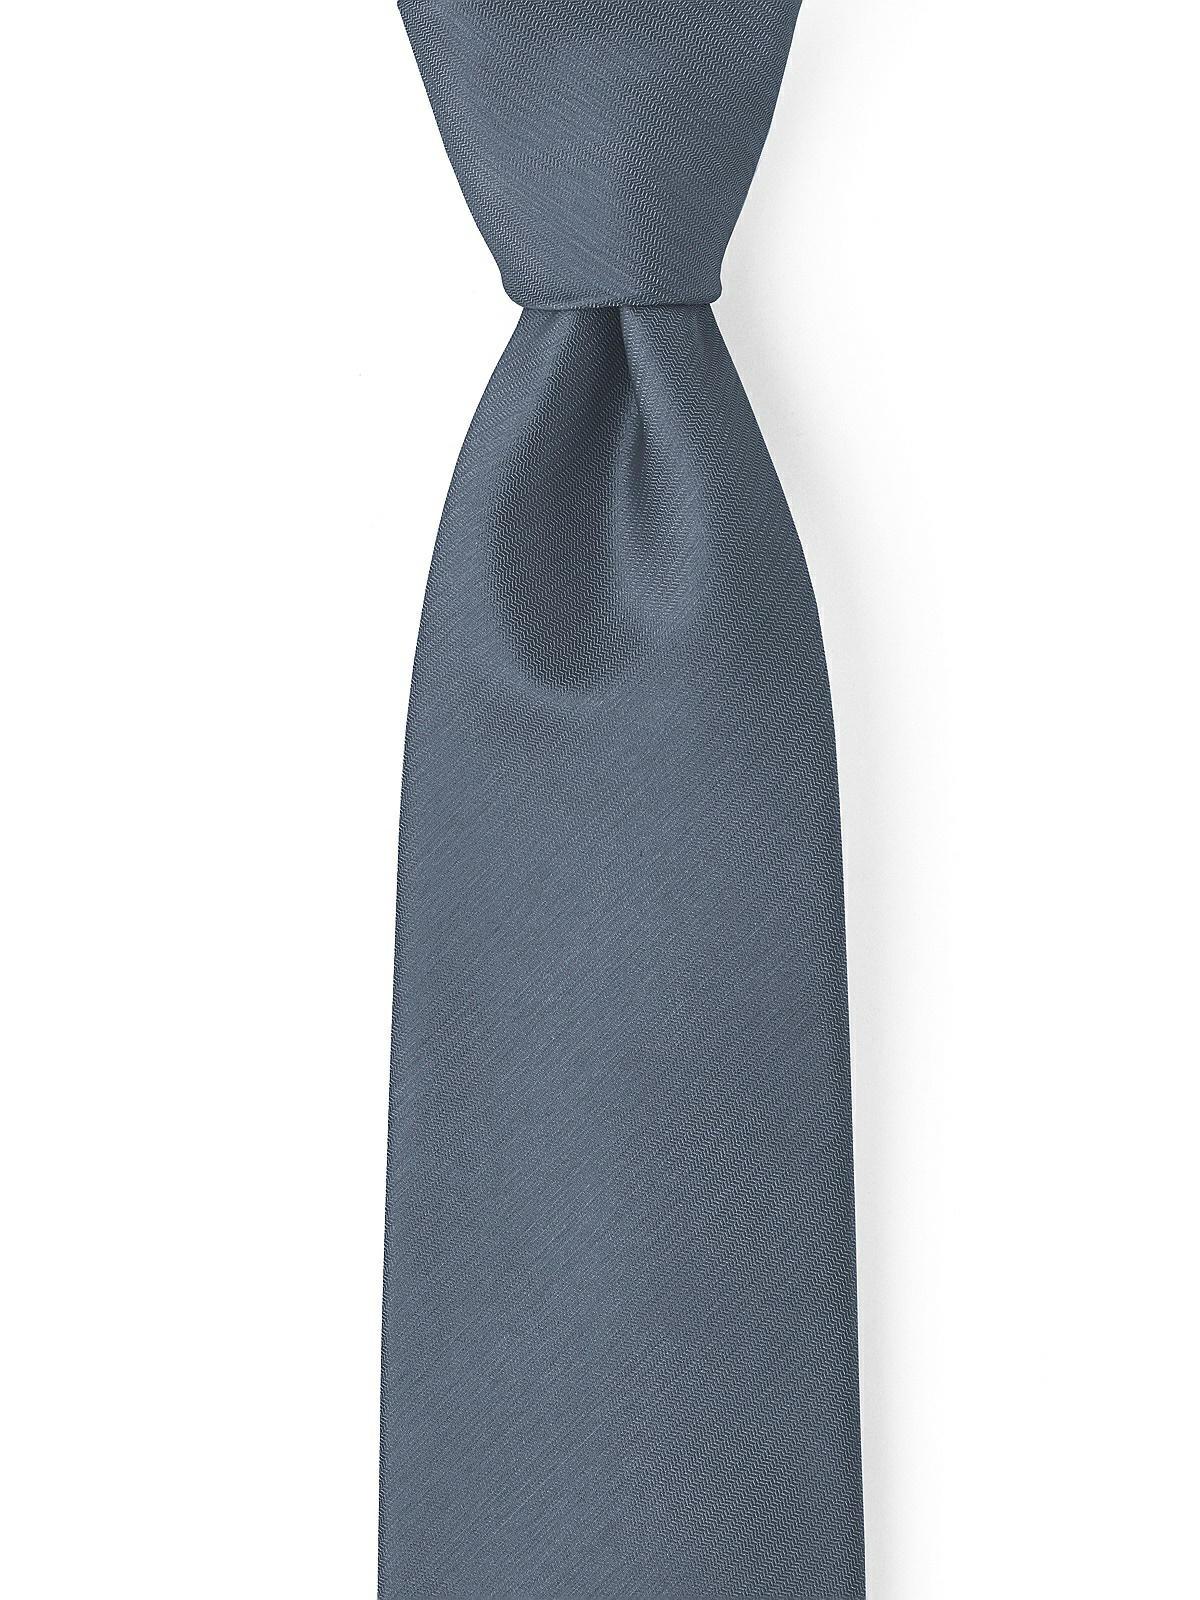 *Sale* Midnight Dark Blue Mens Ties Formal Wedding Male Neck Tie Formal Cheap